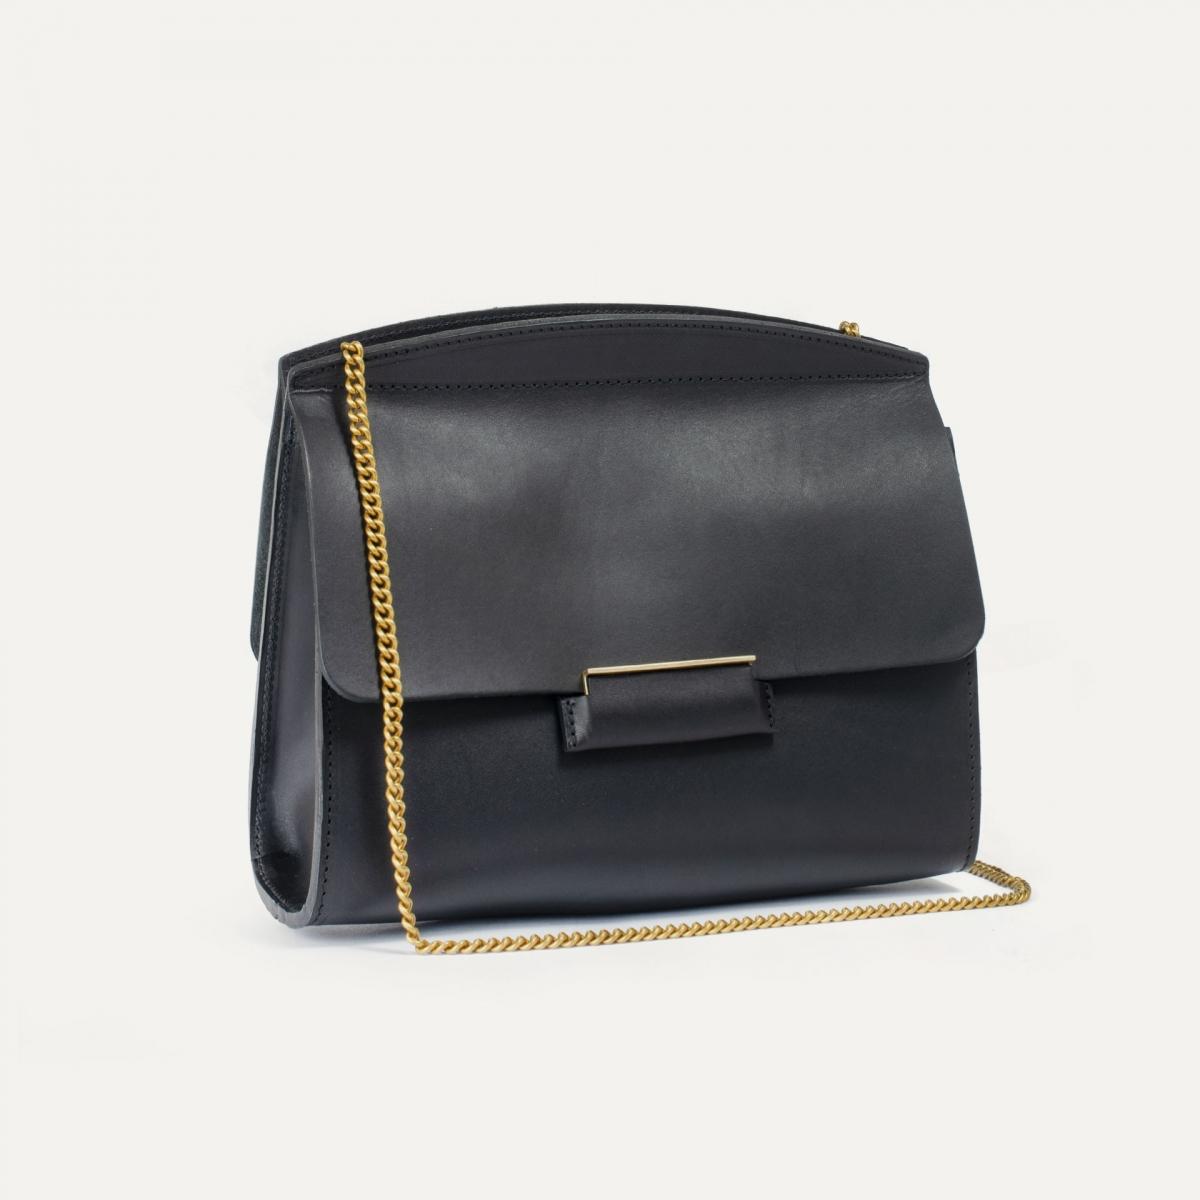 Origami S clutch bag - Black (image n°3)